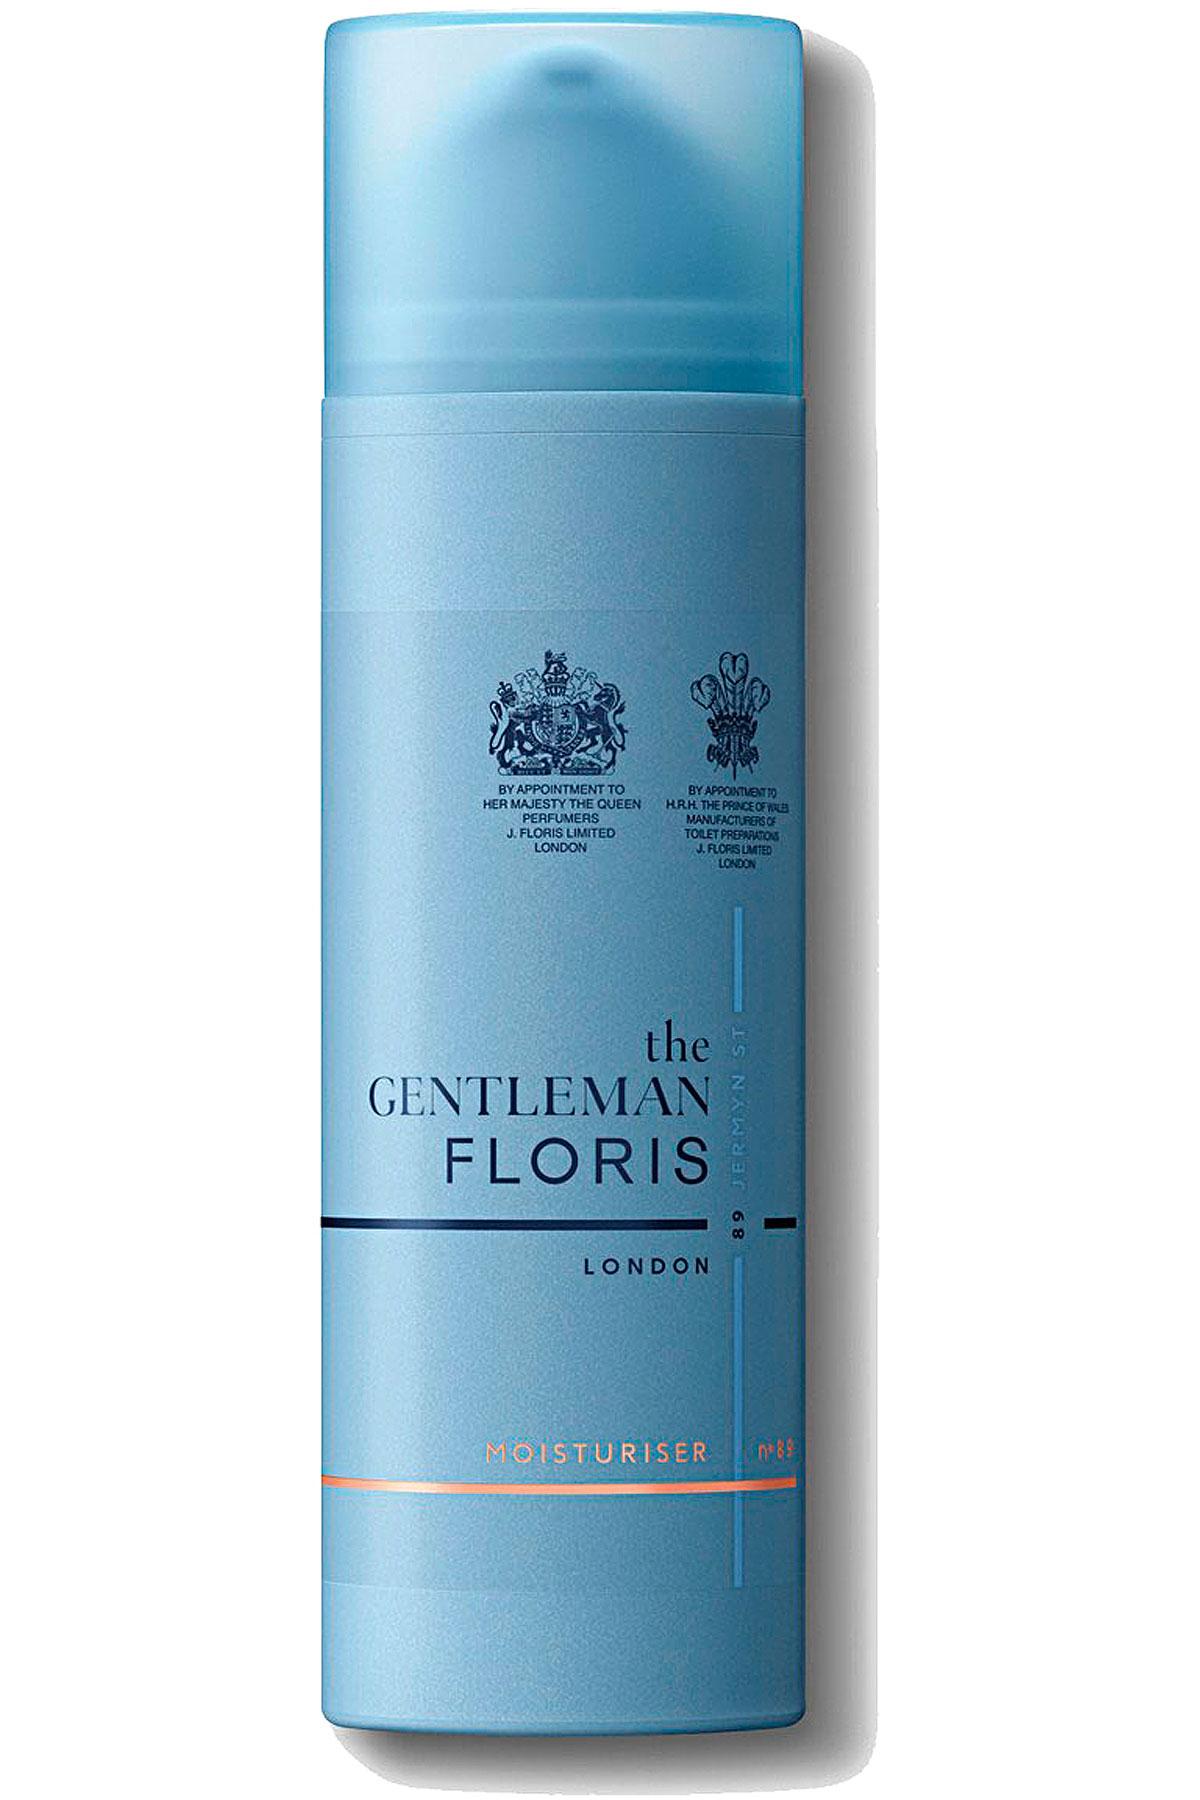 Floris London Beauty for Men On Sale, No. 89 - Facial Moisturiser - 50 Ml, 2019, 50 ml